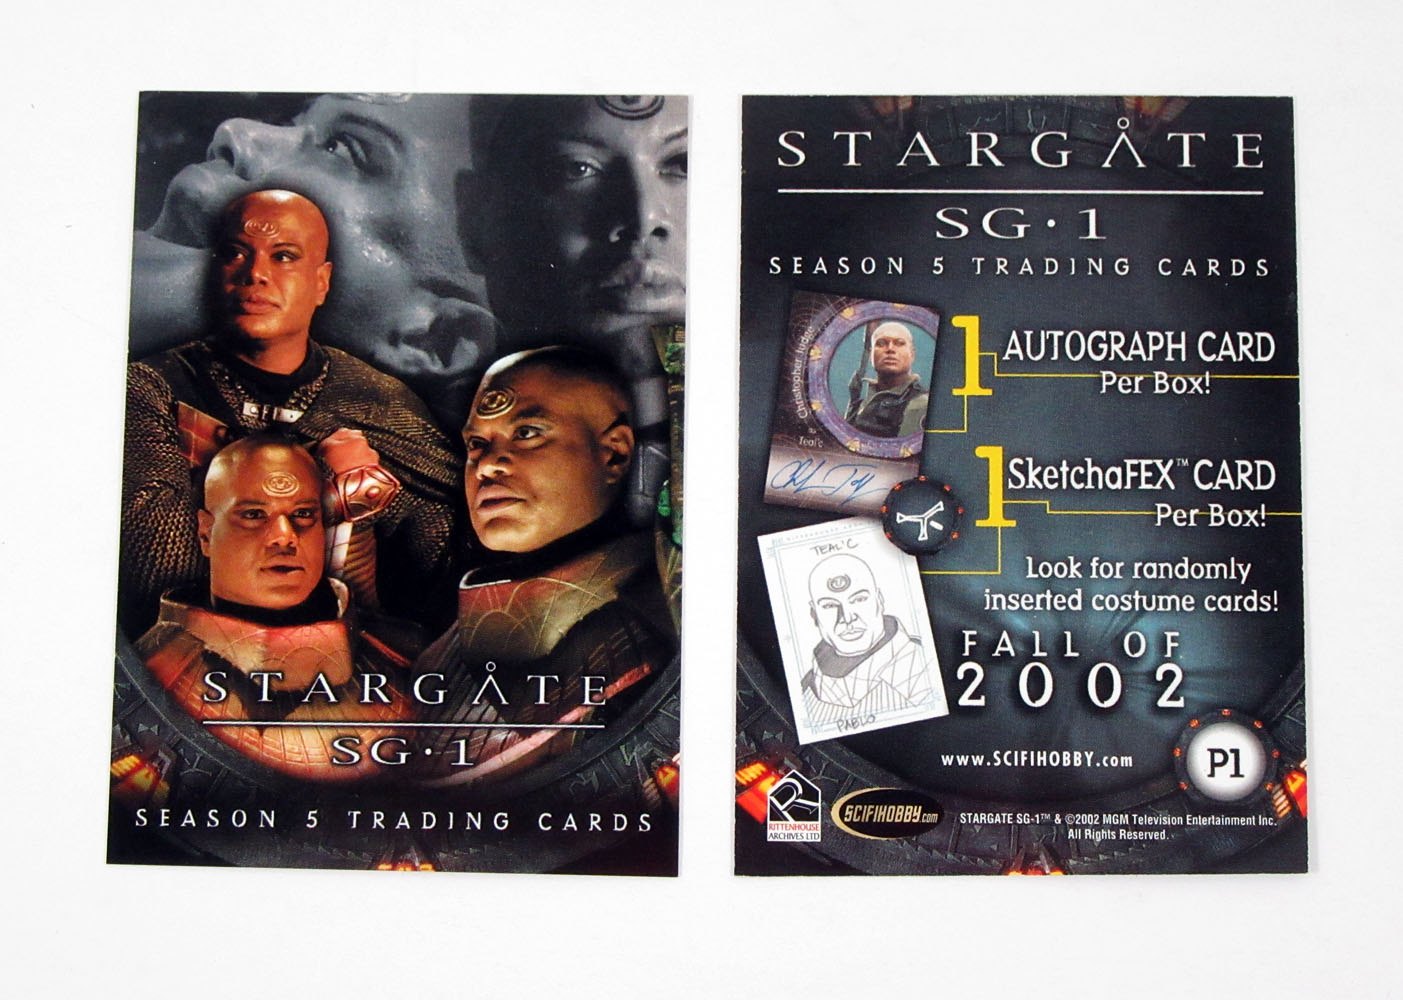 Stargate SG1 Season 5 Bobblehead Mail In Promo Card